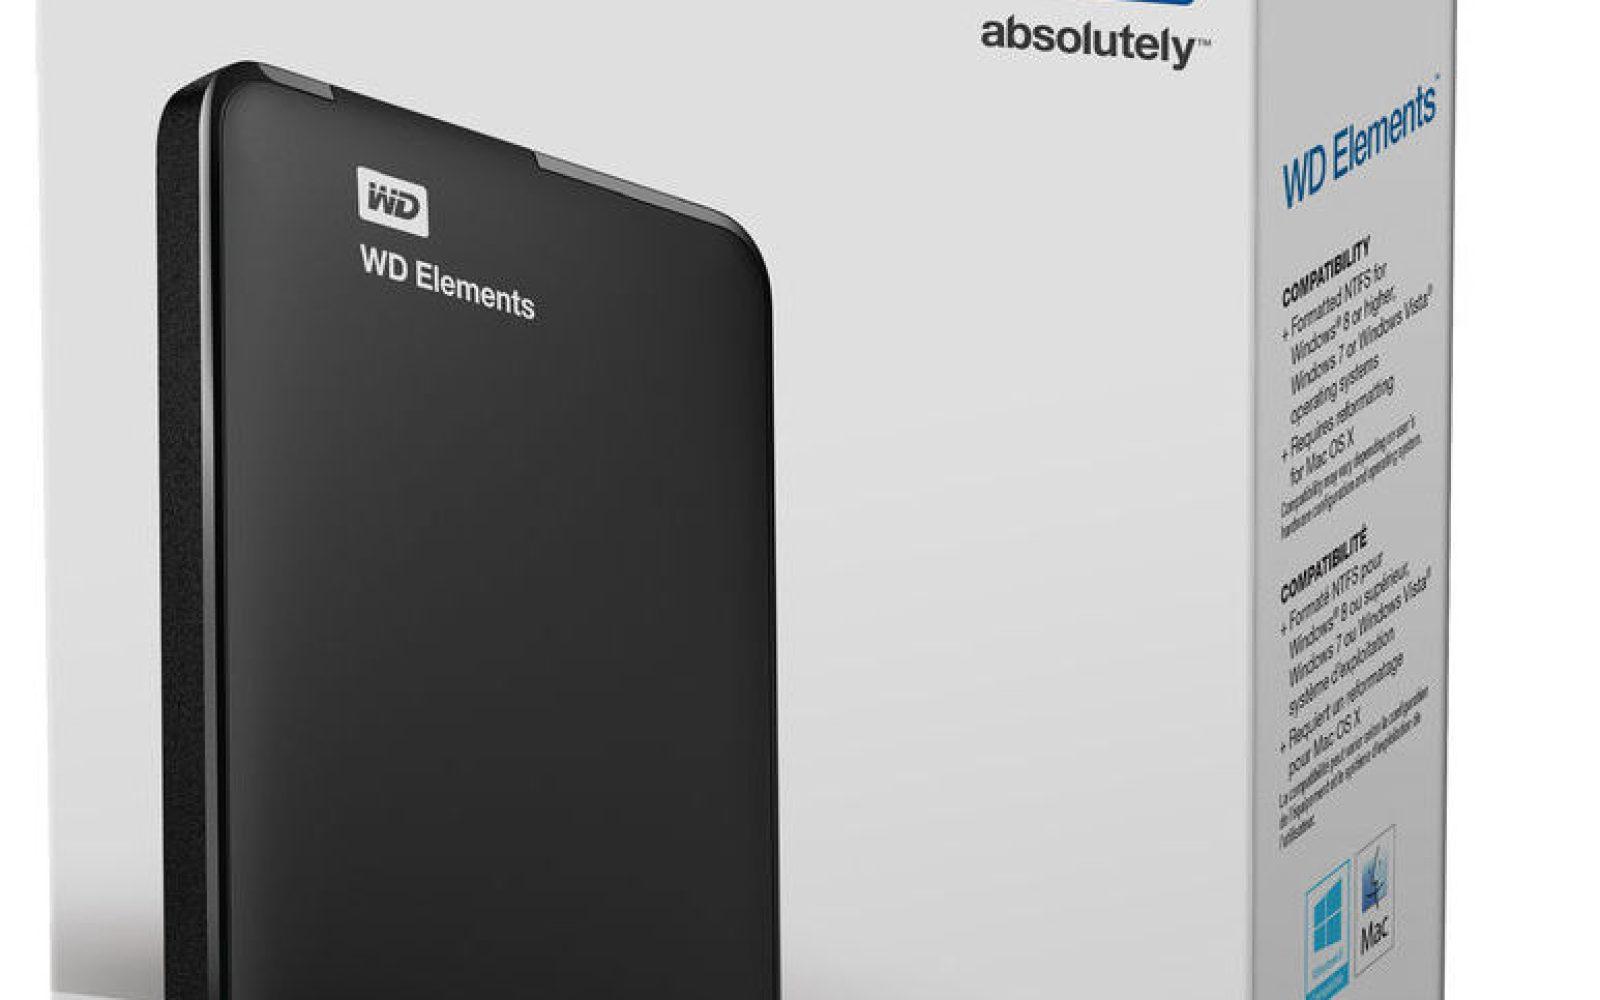 Wd Elements 1tb Portable Usb 30 Hard Drive 50 Shipped Orig 70 Hardisk External